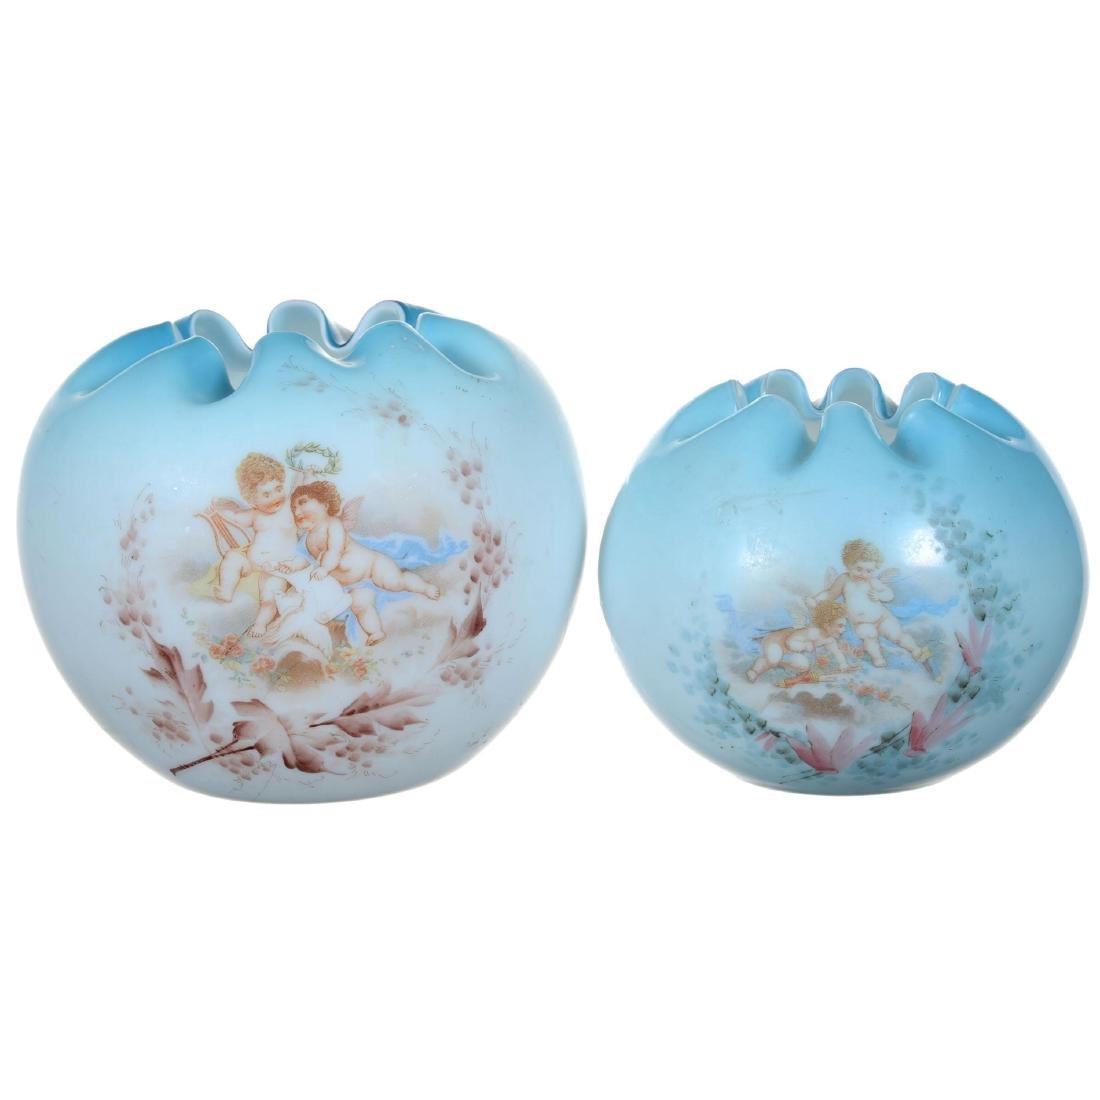 (2) Blue Art Glass Rose Bowls